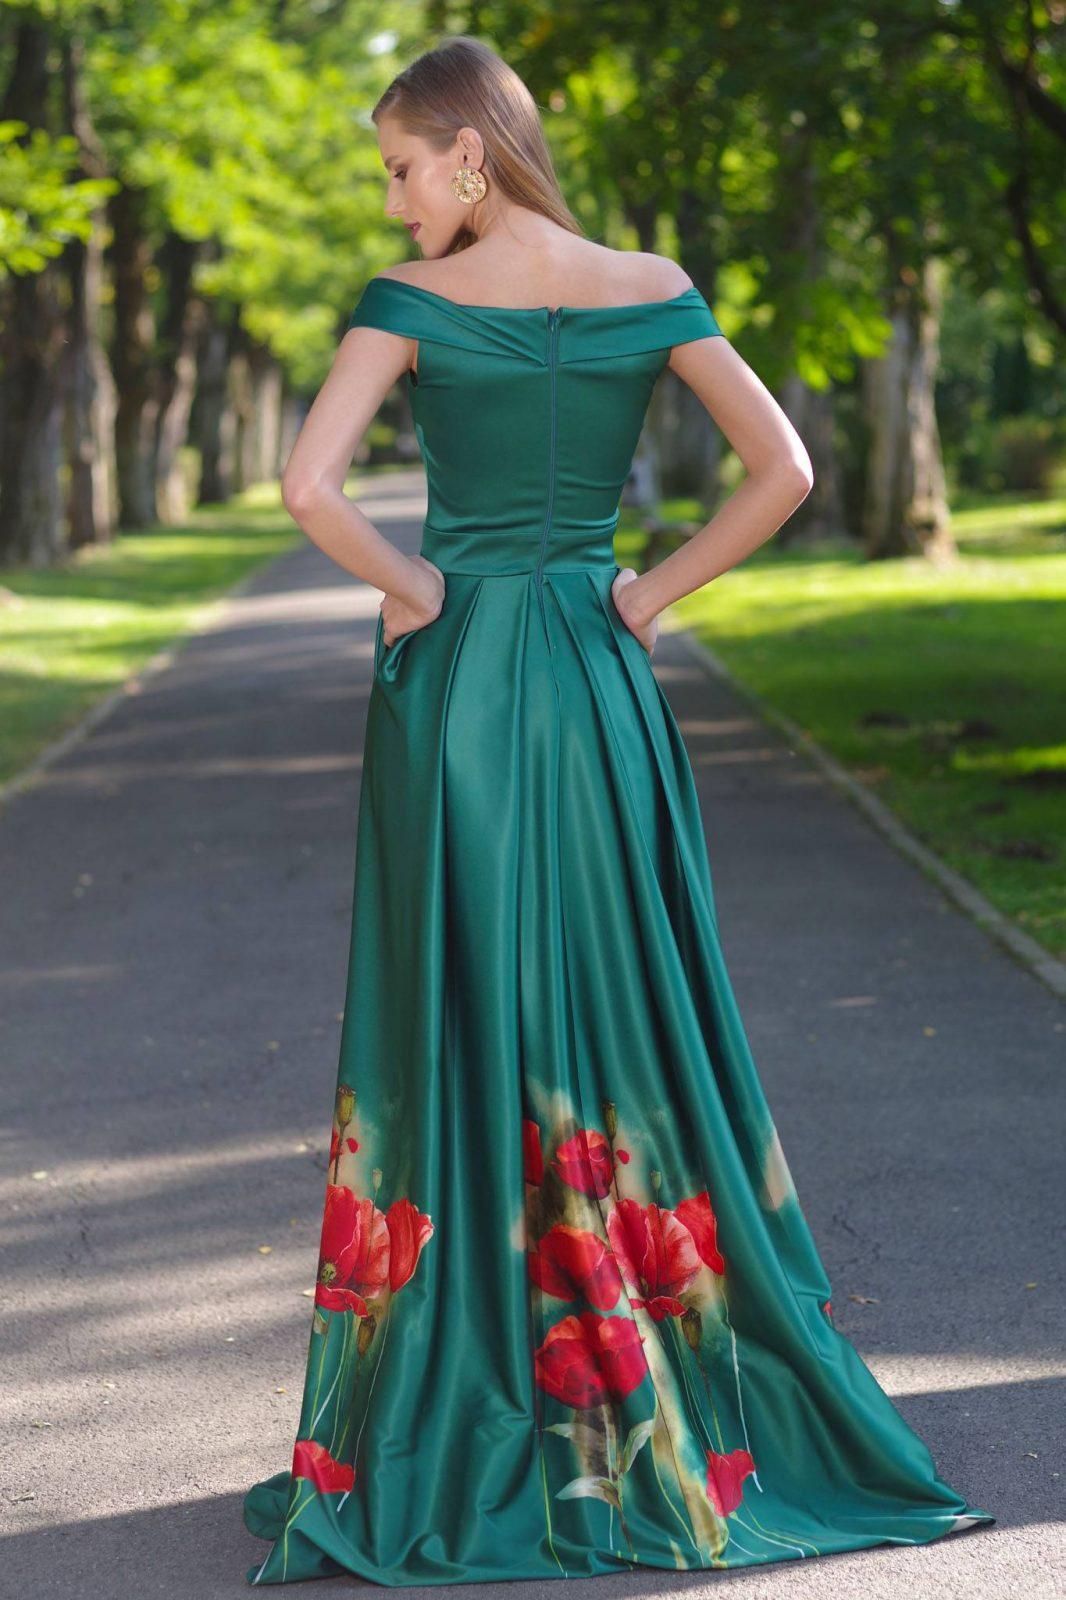 DeLuxe Πράσινο Φόρεμα 1400